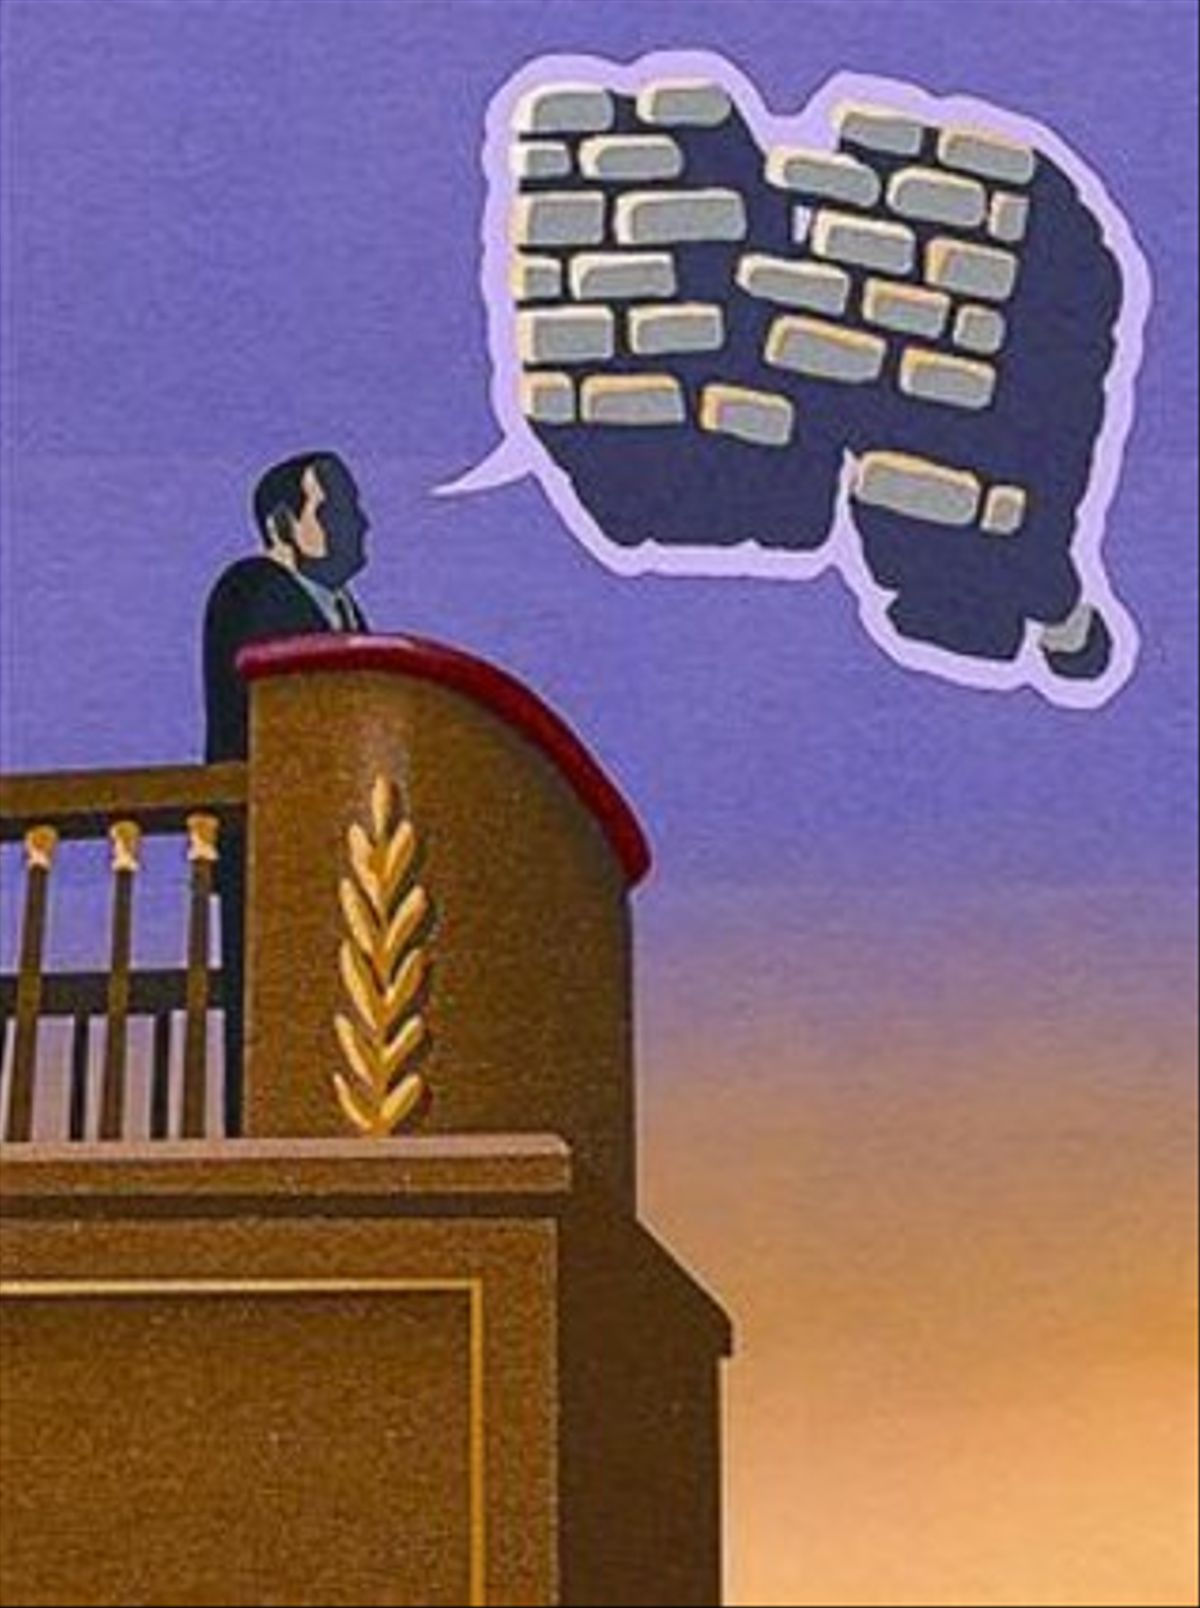 Palabras rotas sin discurso político